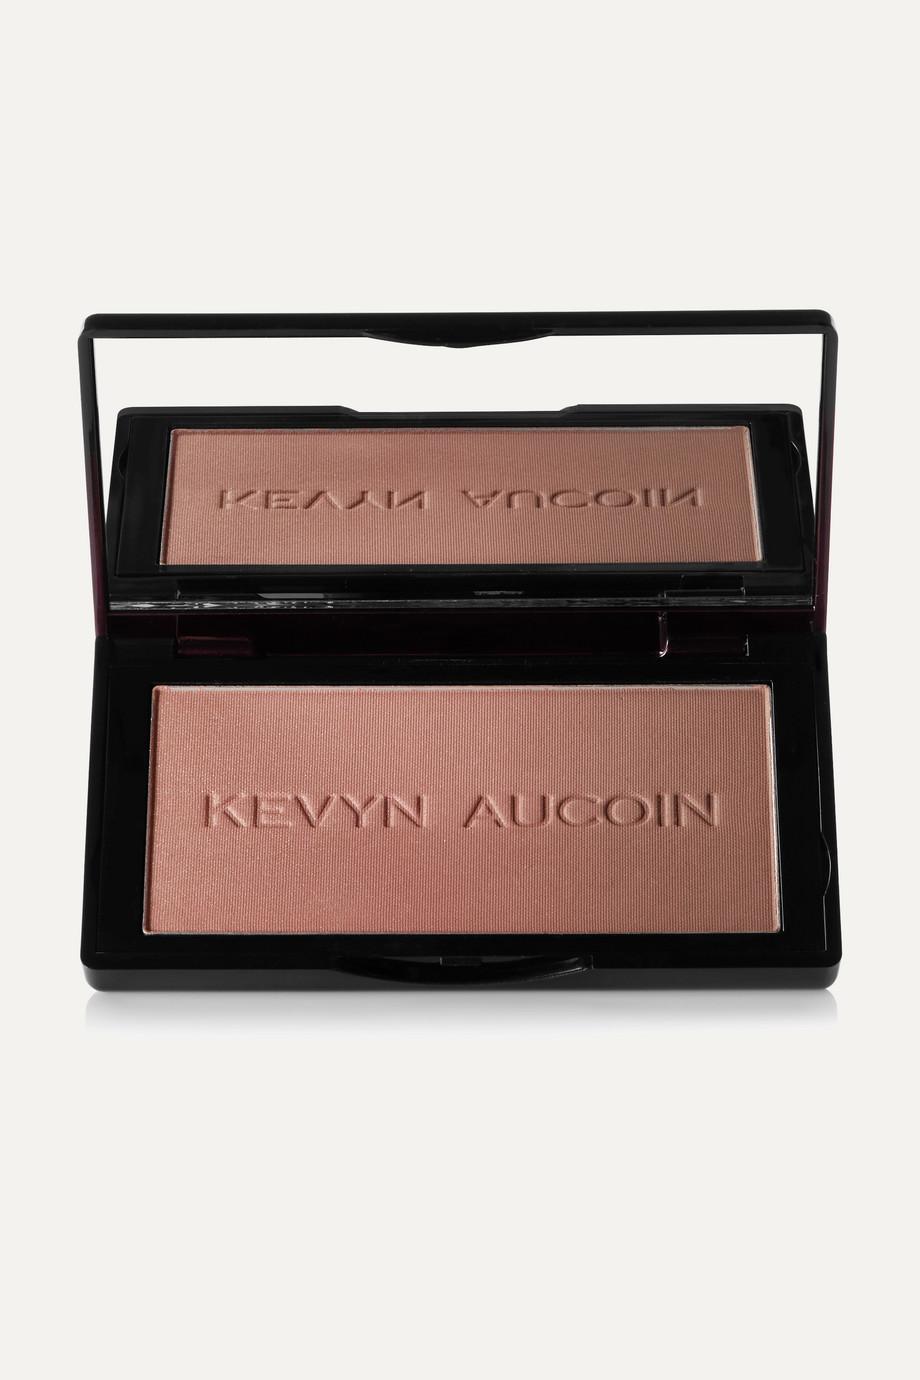 Kevyn Aucoin Poudre bronzante The Neo Bronzer, Sunrise